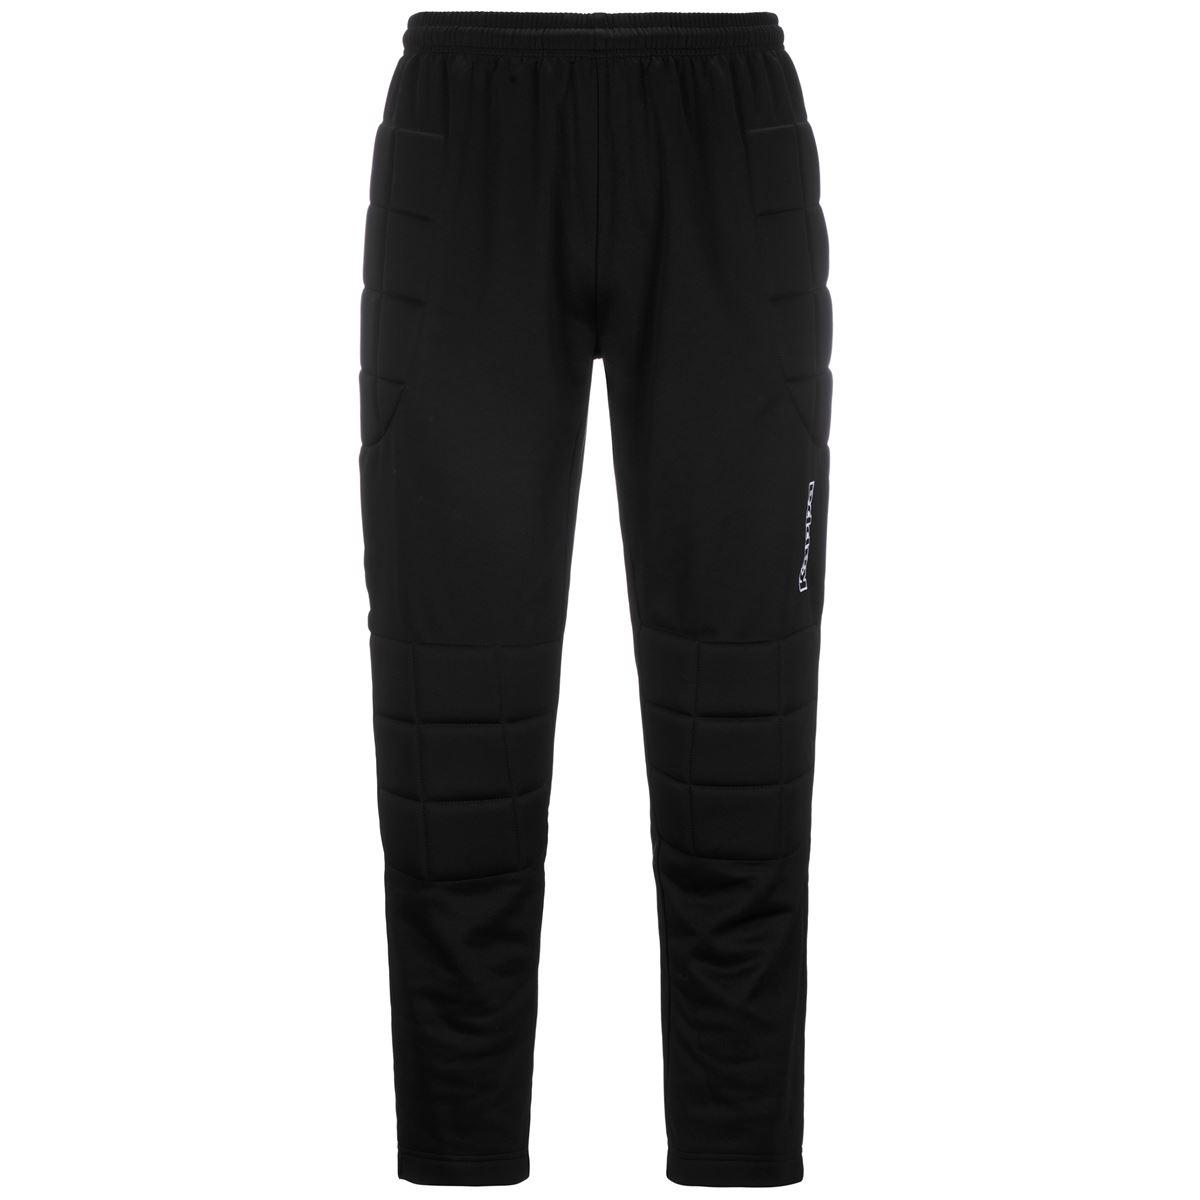 Kappa Pantaloni uomo-303JV30